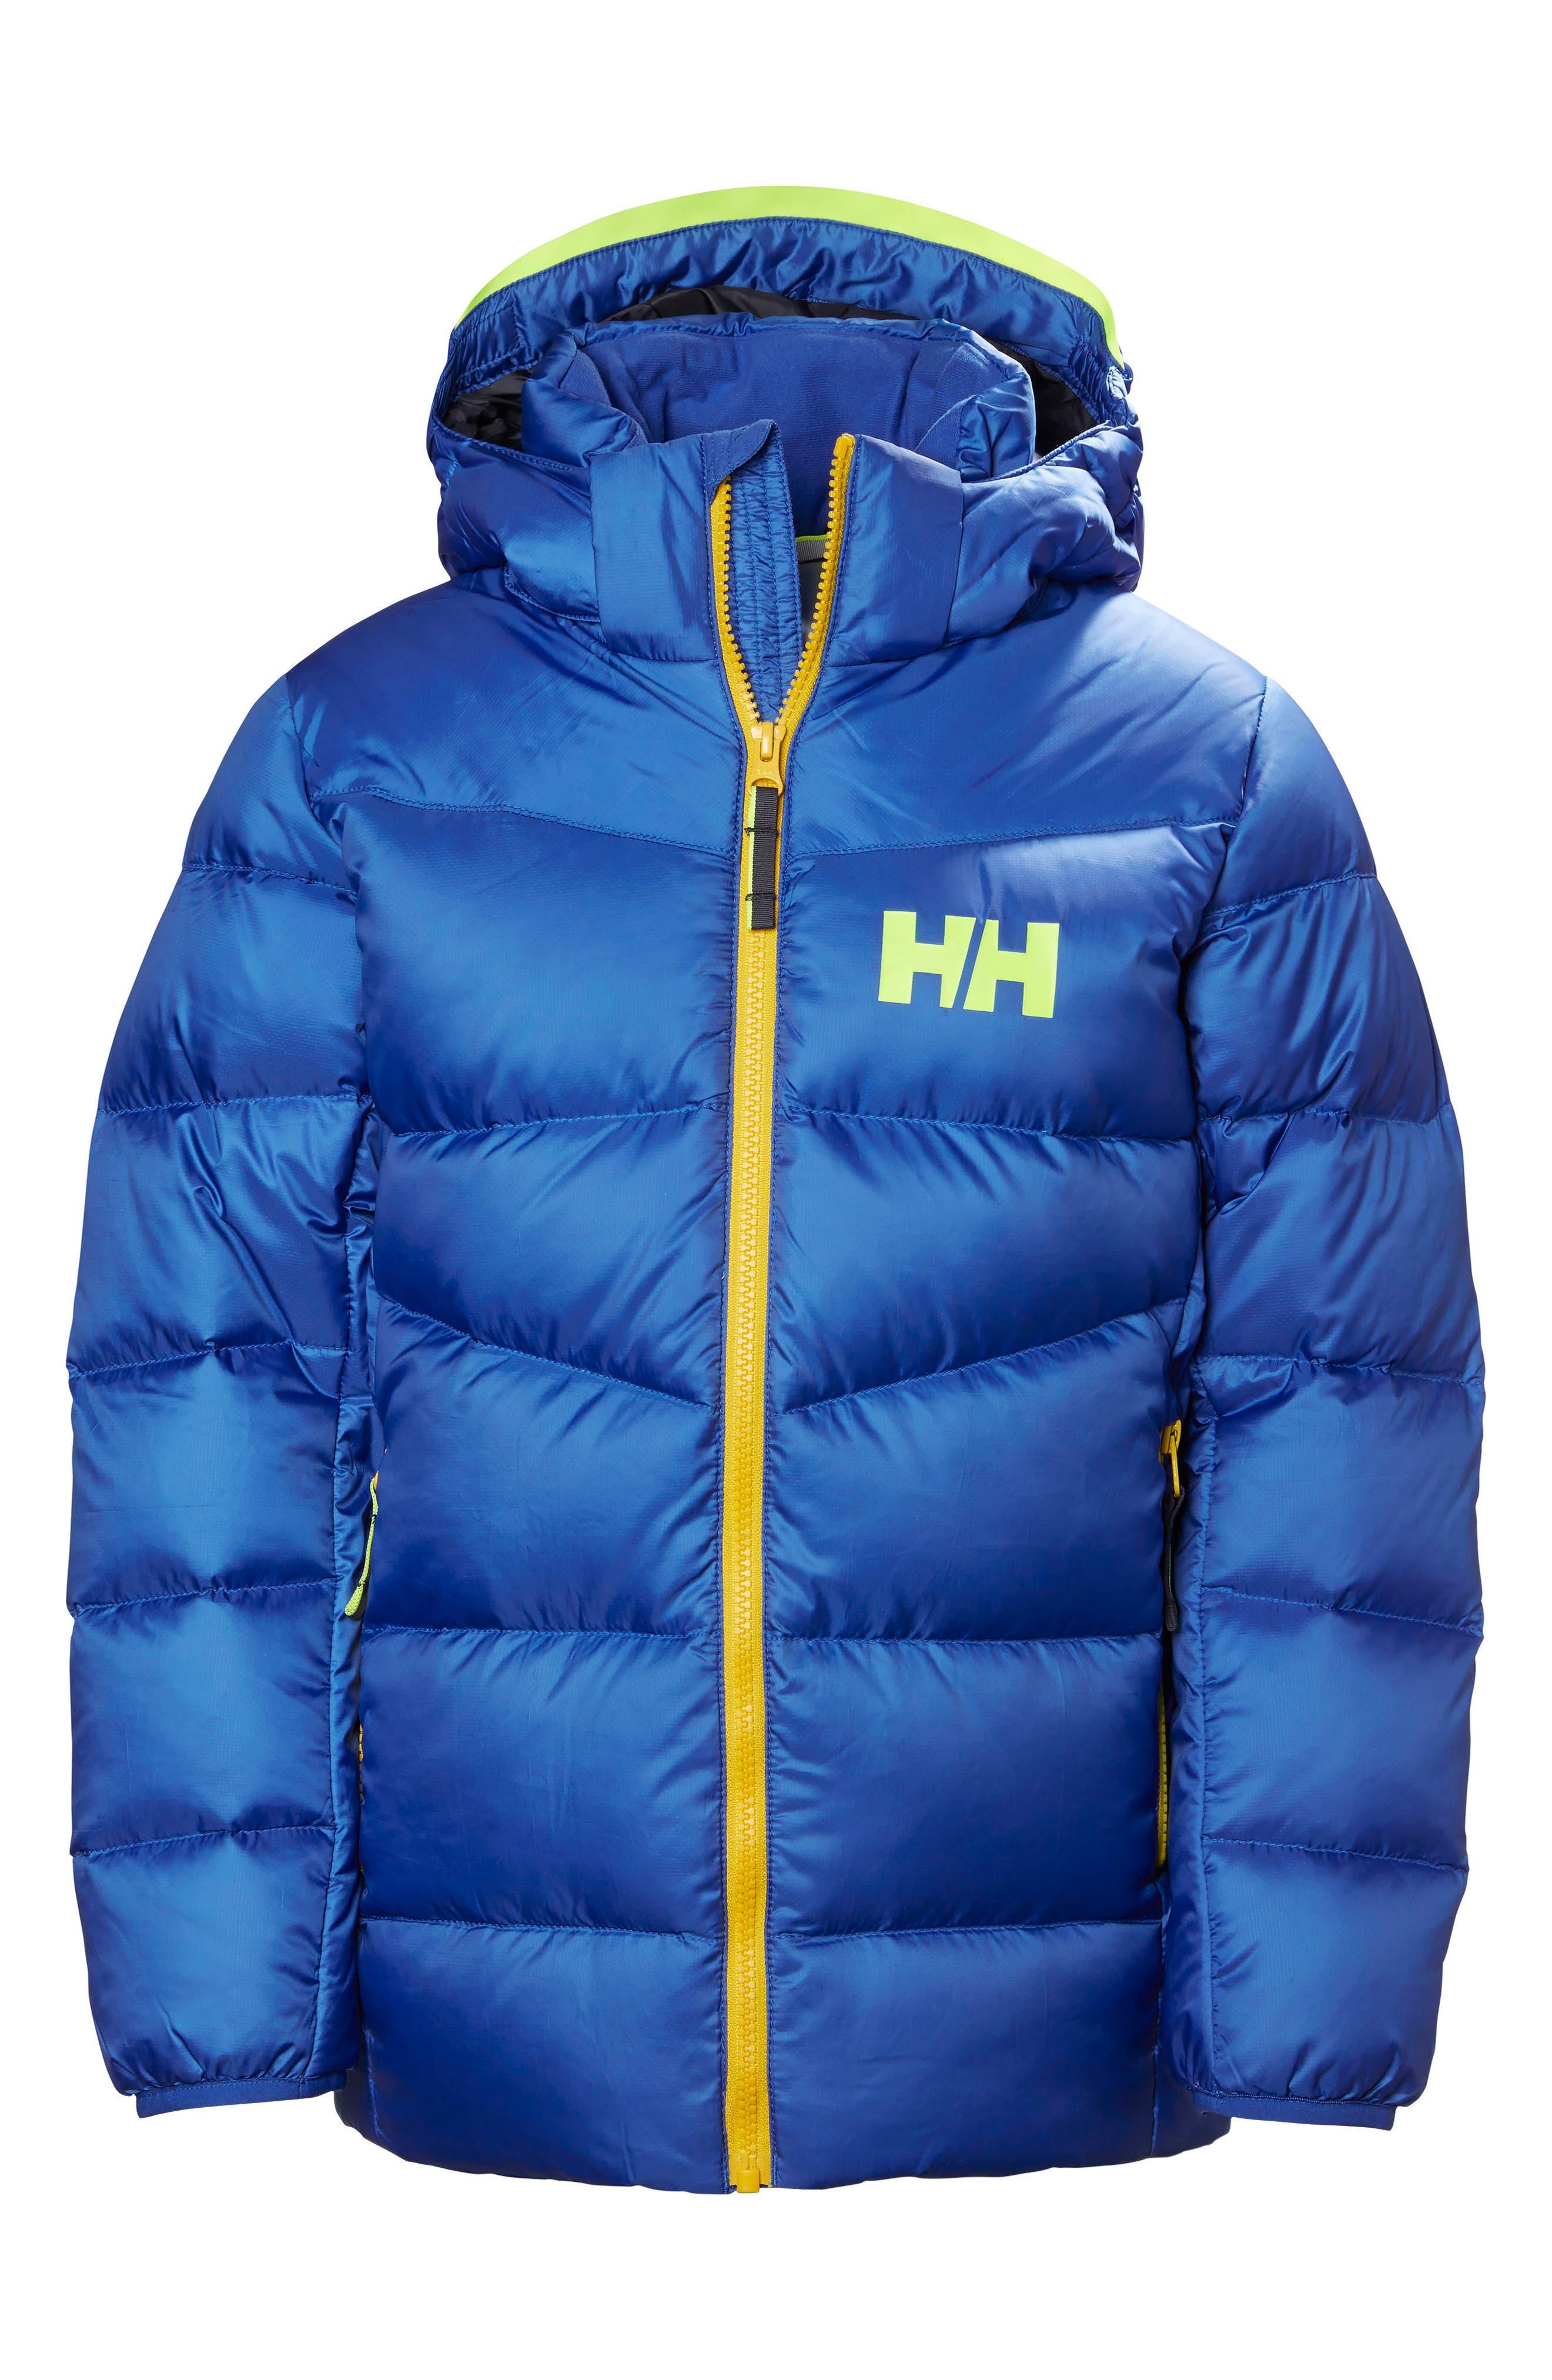 Main Image - Helly Hansen Fjord Water Resistant Puffer Jacket (Big Boys)